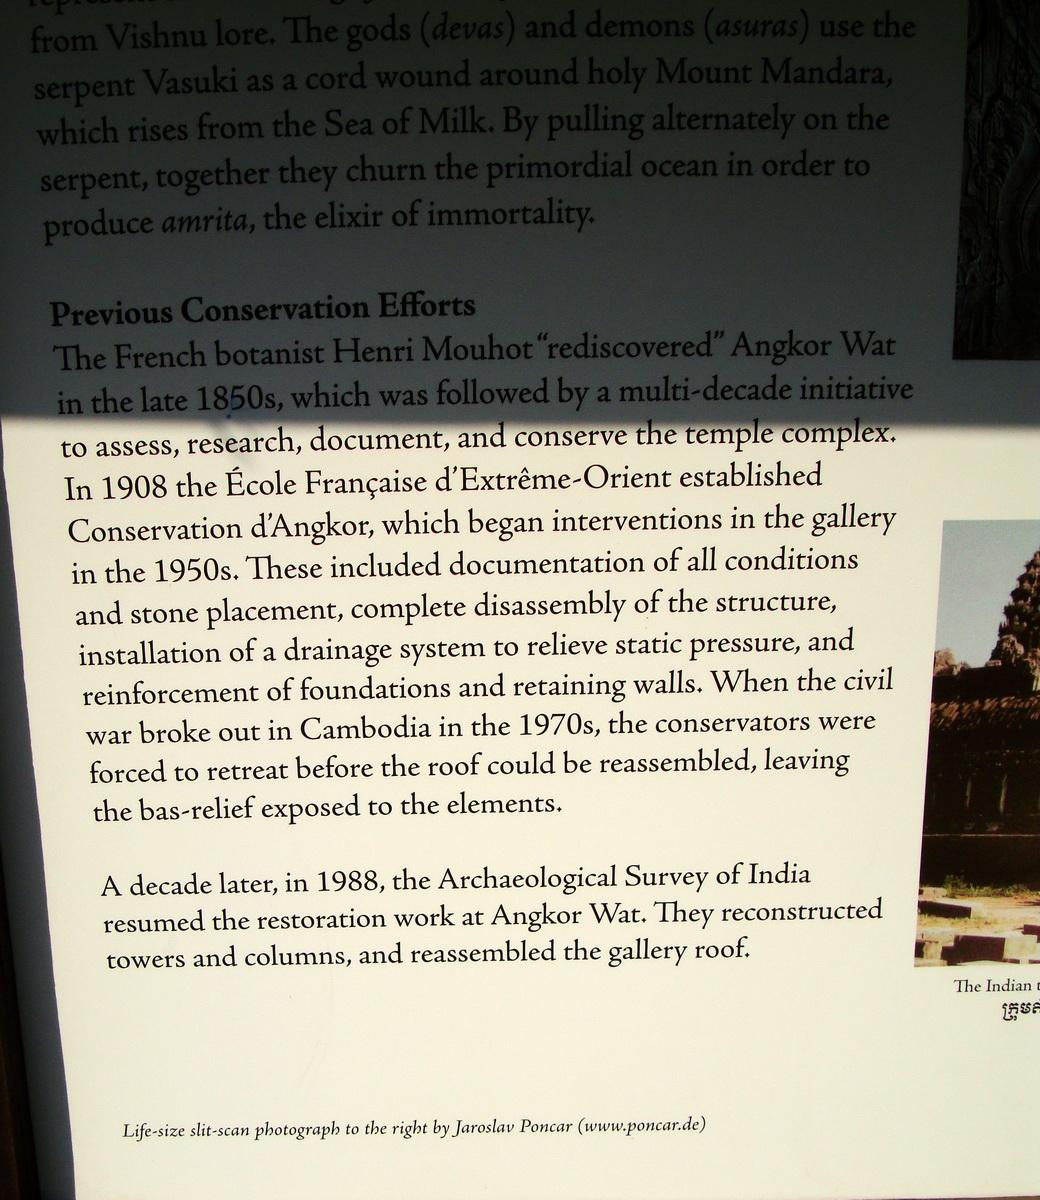 1 Angkor Wat notice board Churning of the sea of milk 0B